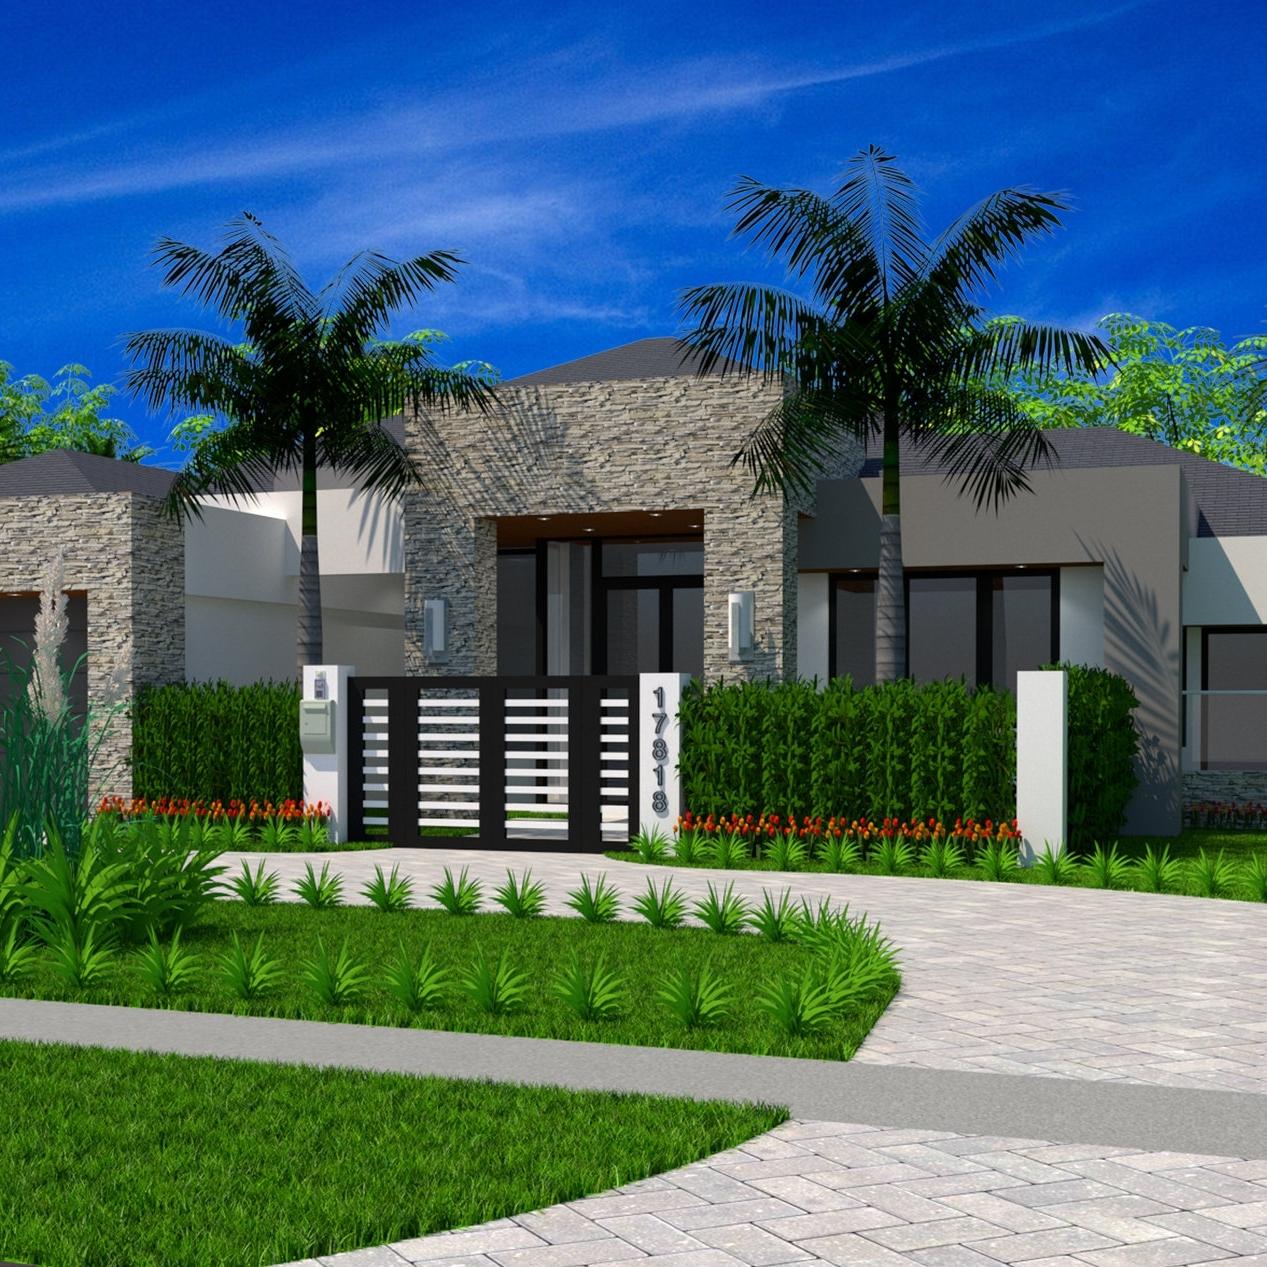 Florida-residential-condo-golf-course-architecture-.jpg